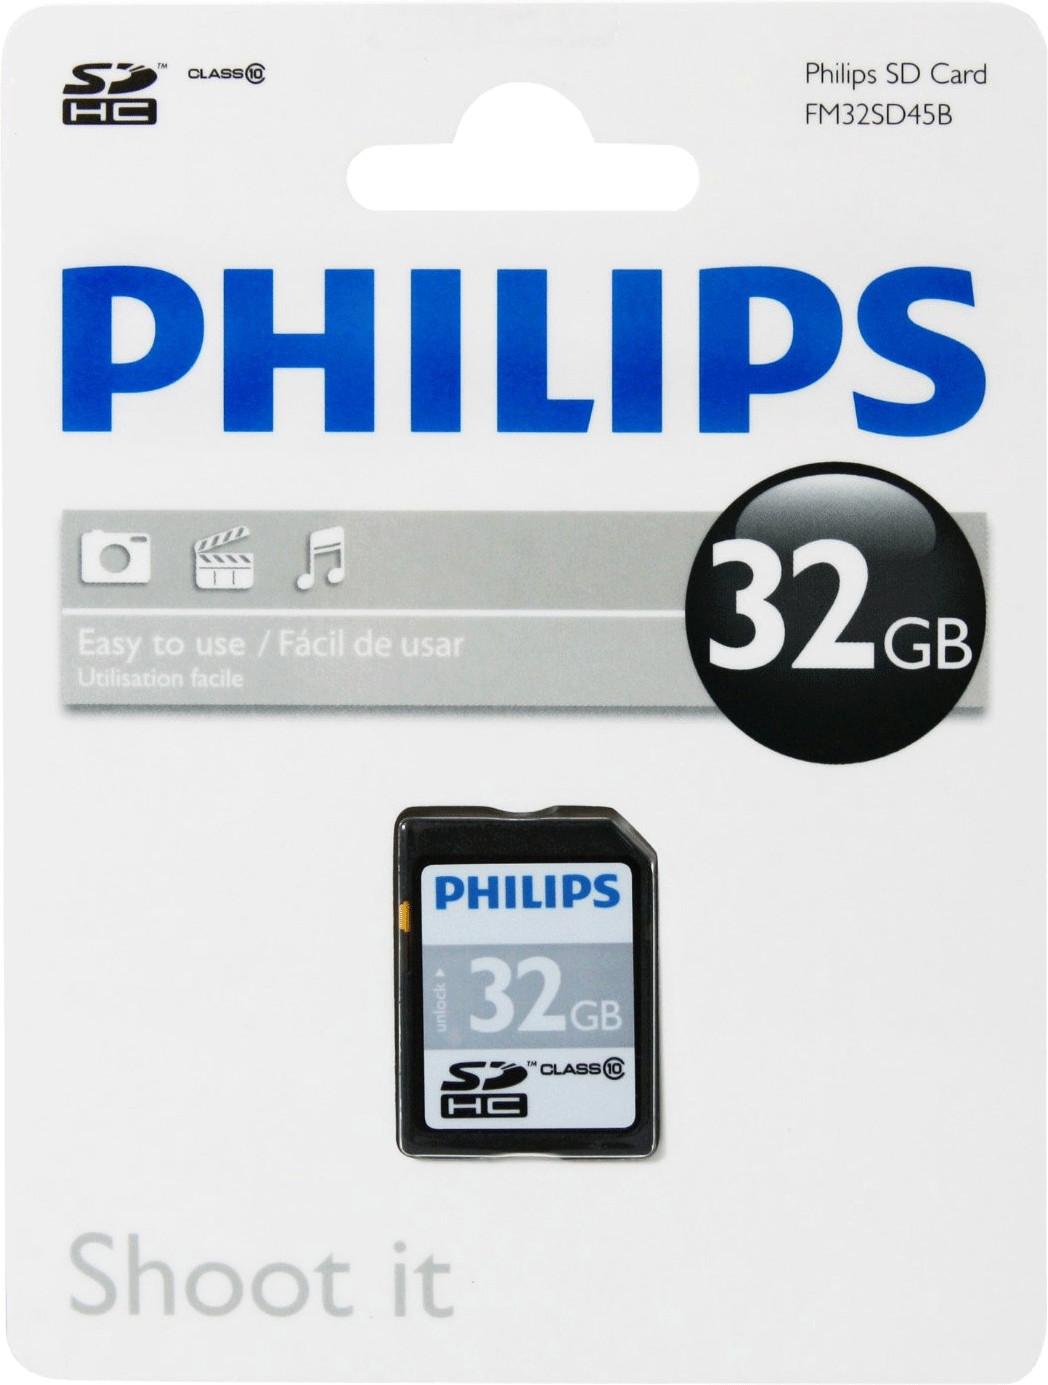 Philips SDHC 32GB Class 10 (FM032SD45B)